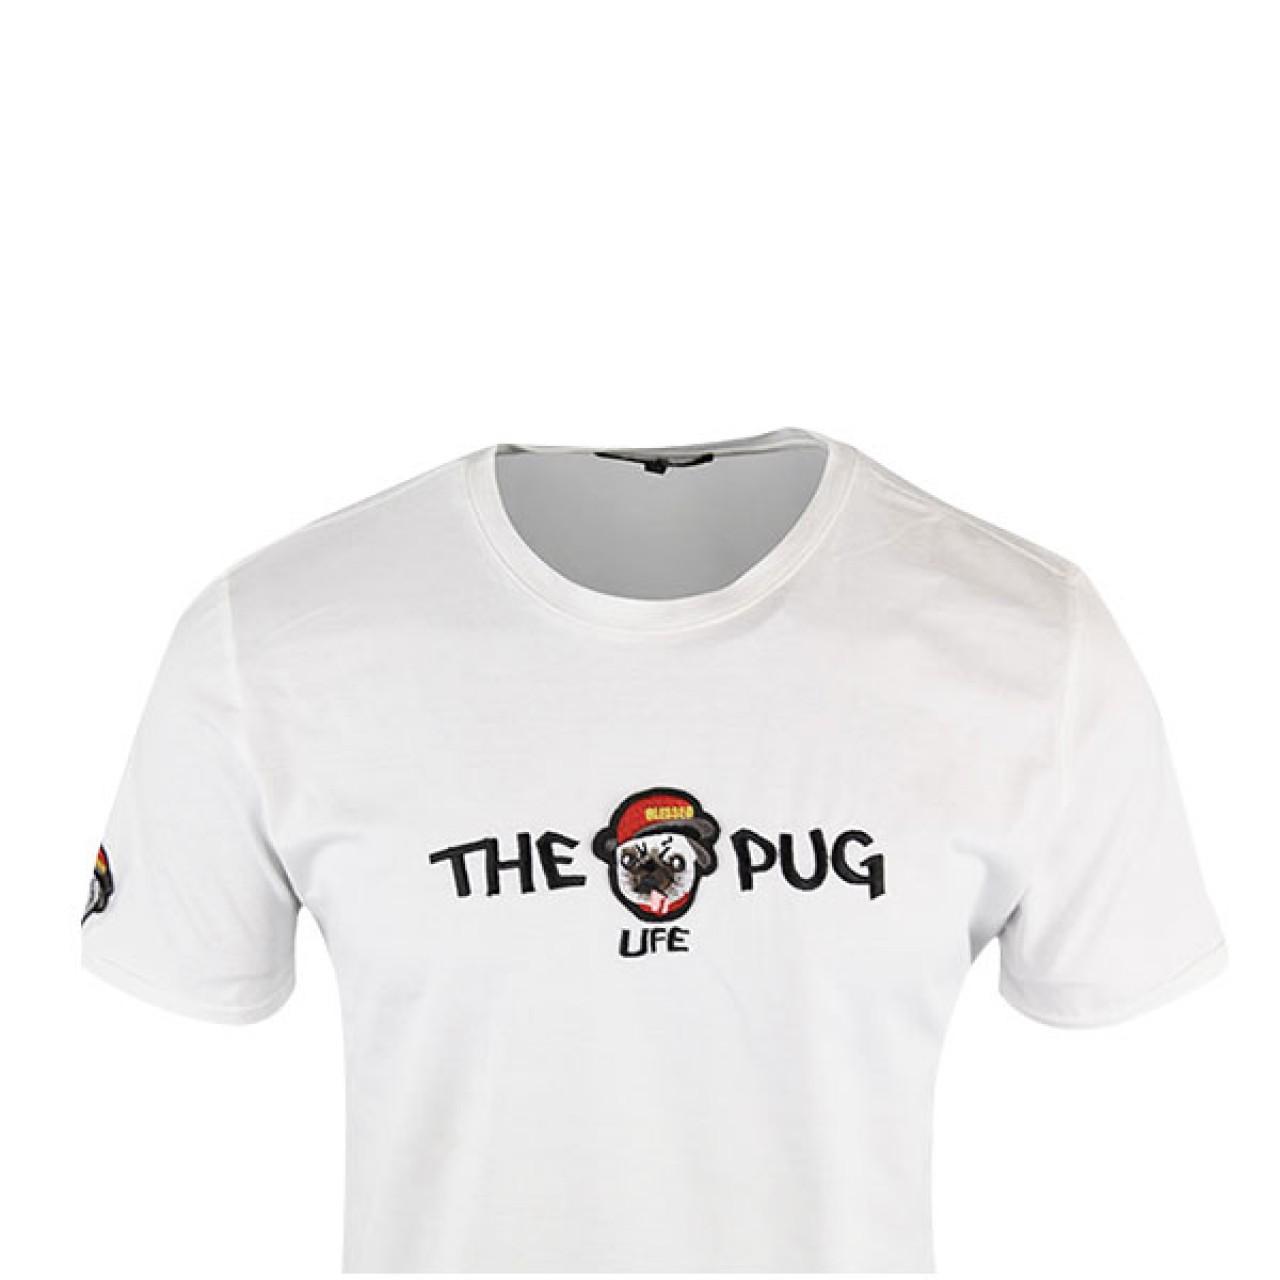 New Pug Life Men's White Crew Neck Tees